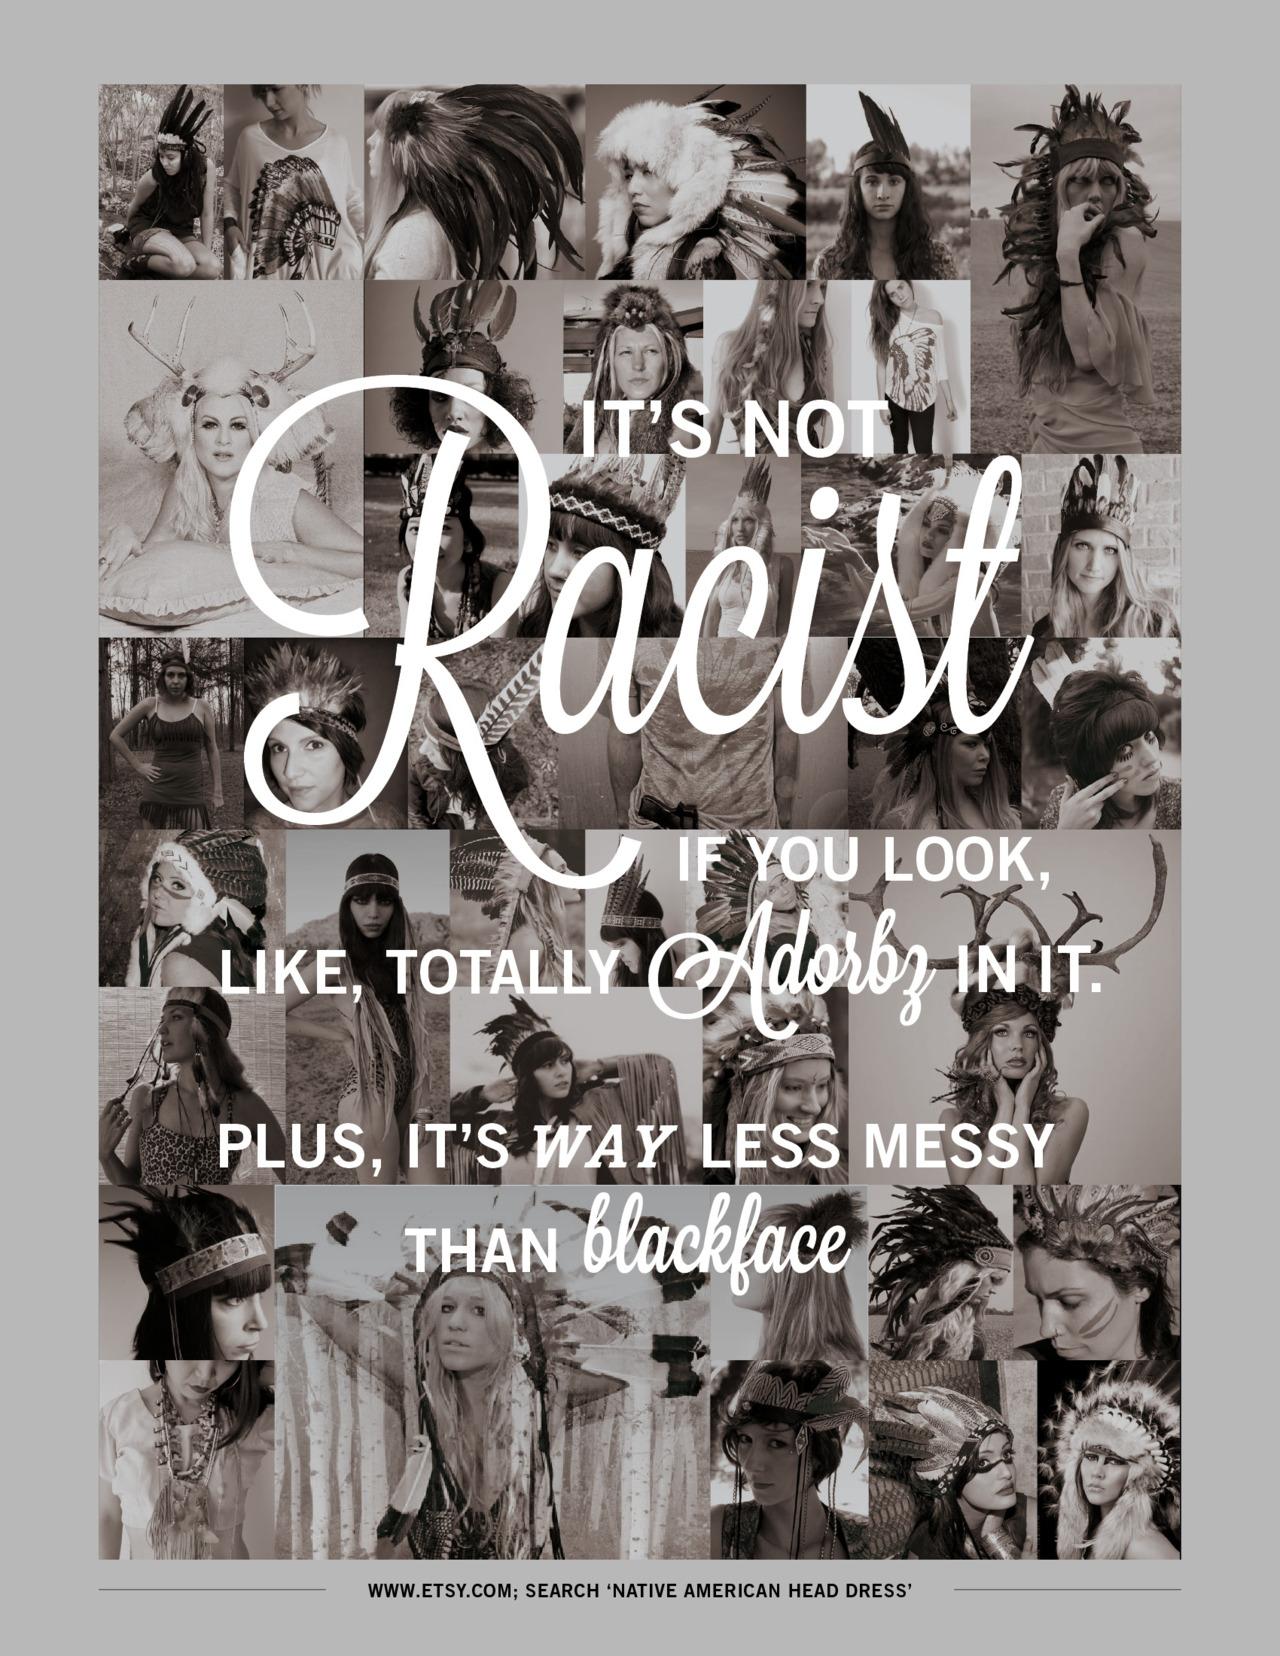 headdress does not make you racist